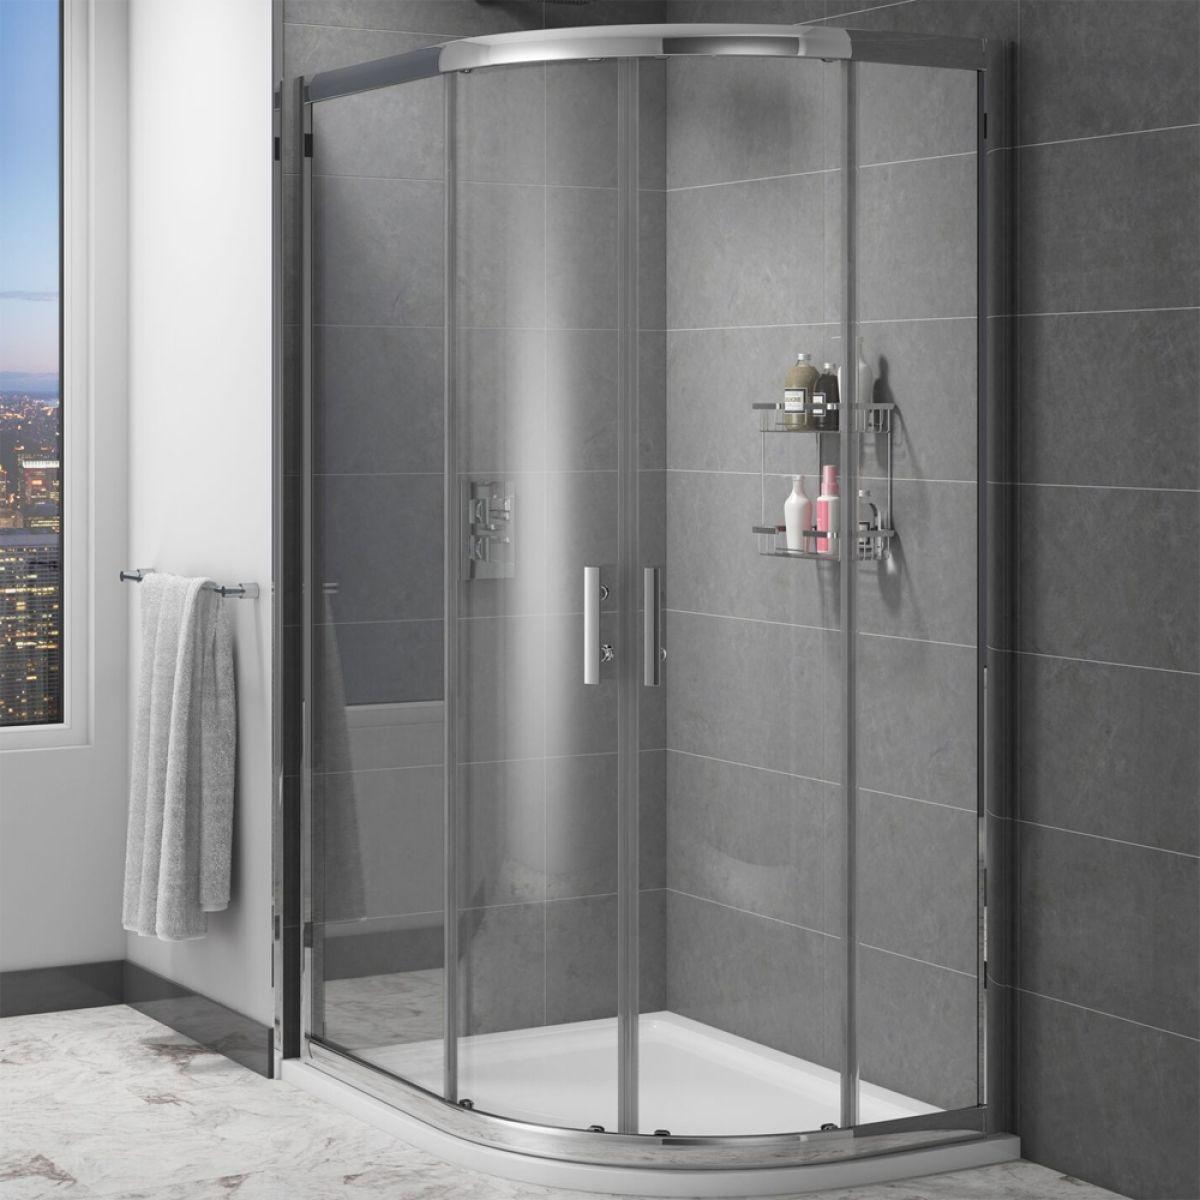 Cassellie Cass Six Quadrant Shower Enclosure